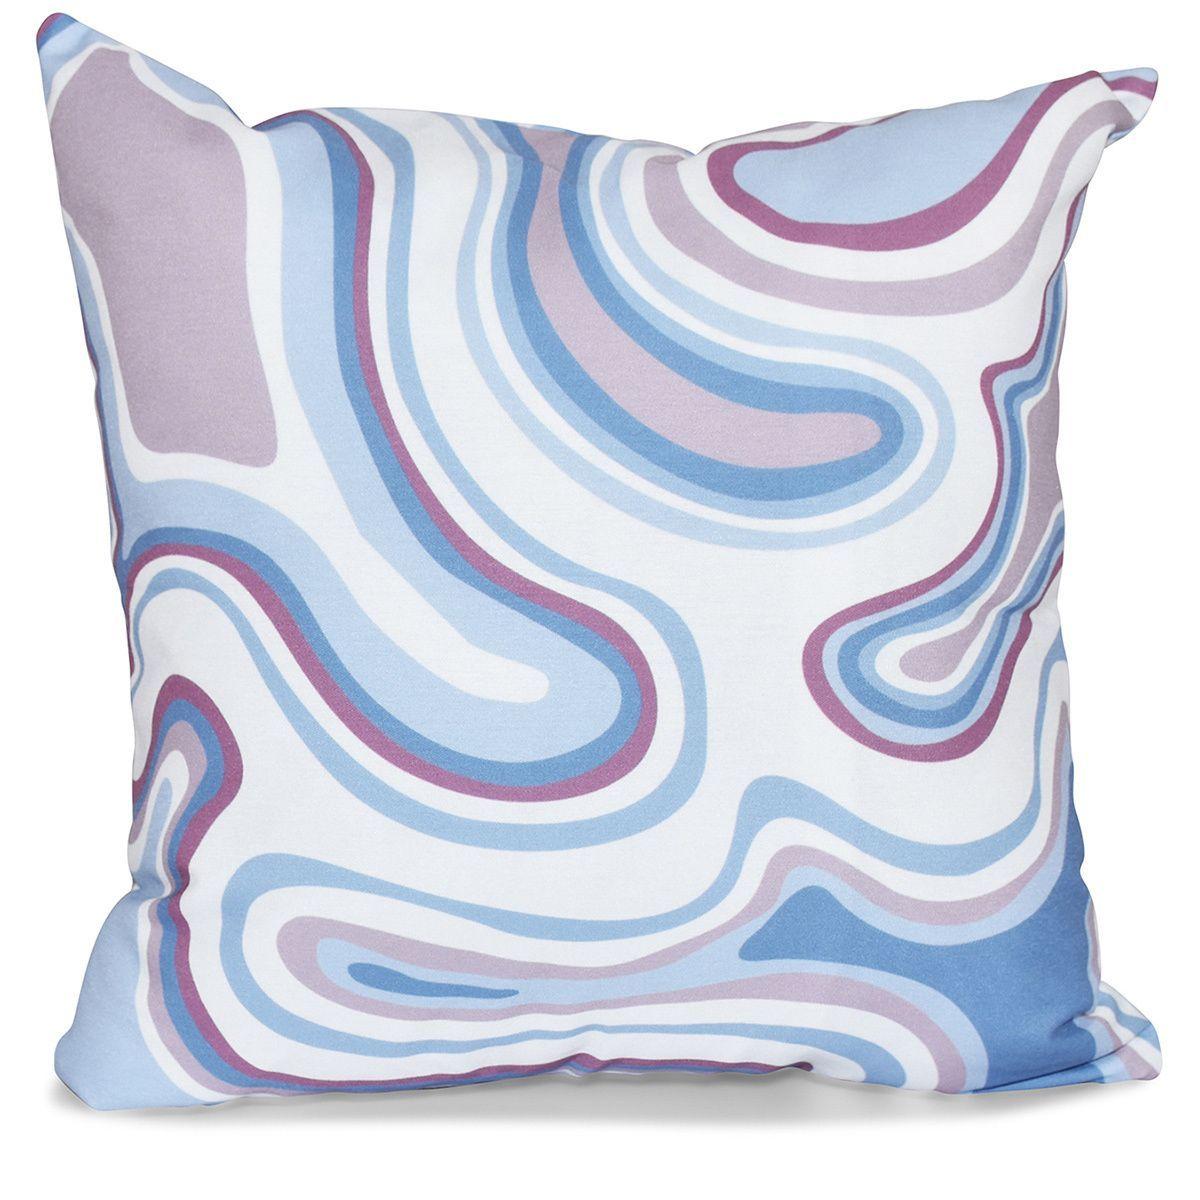 E by design agate geometric print inch pillow teal blue